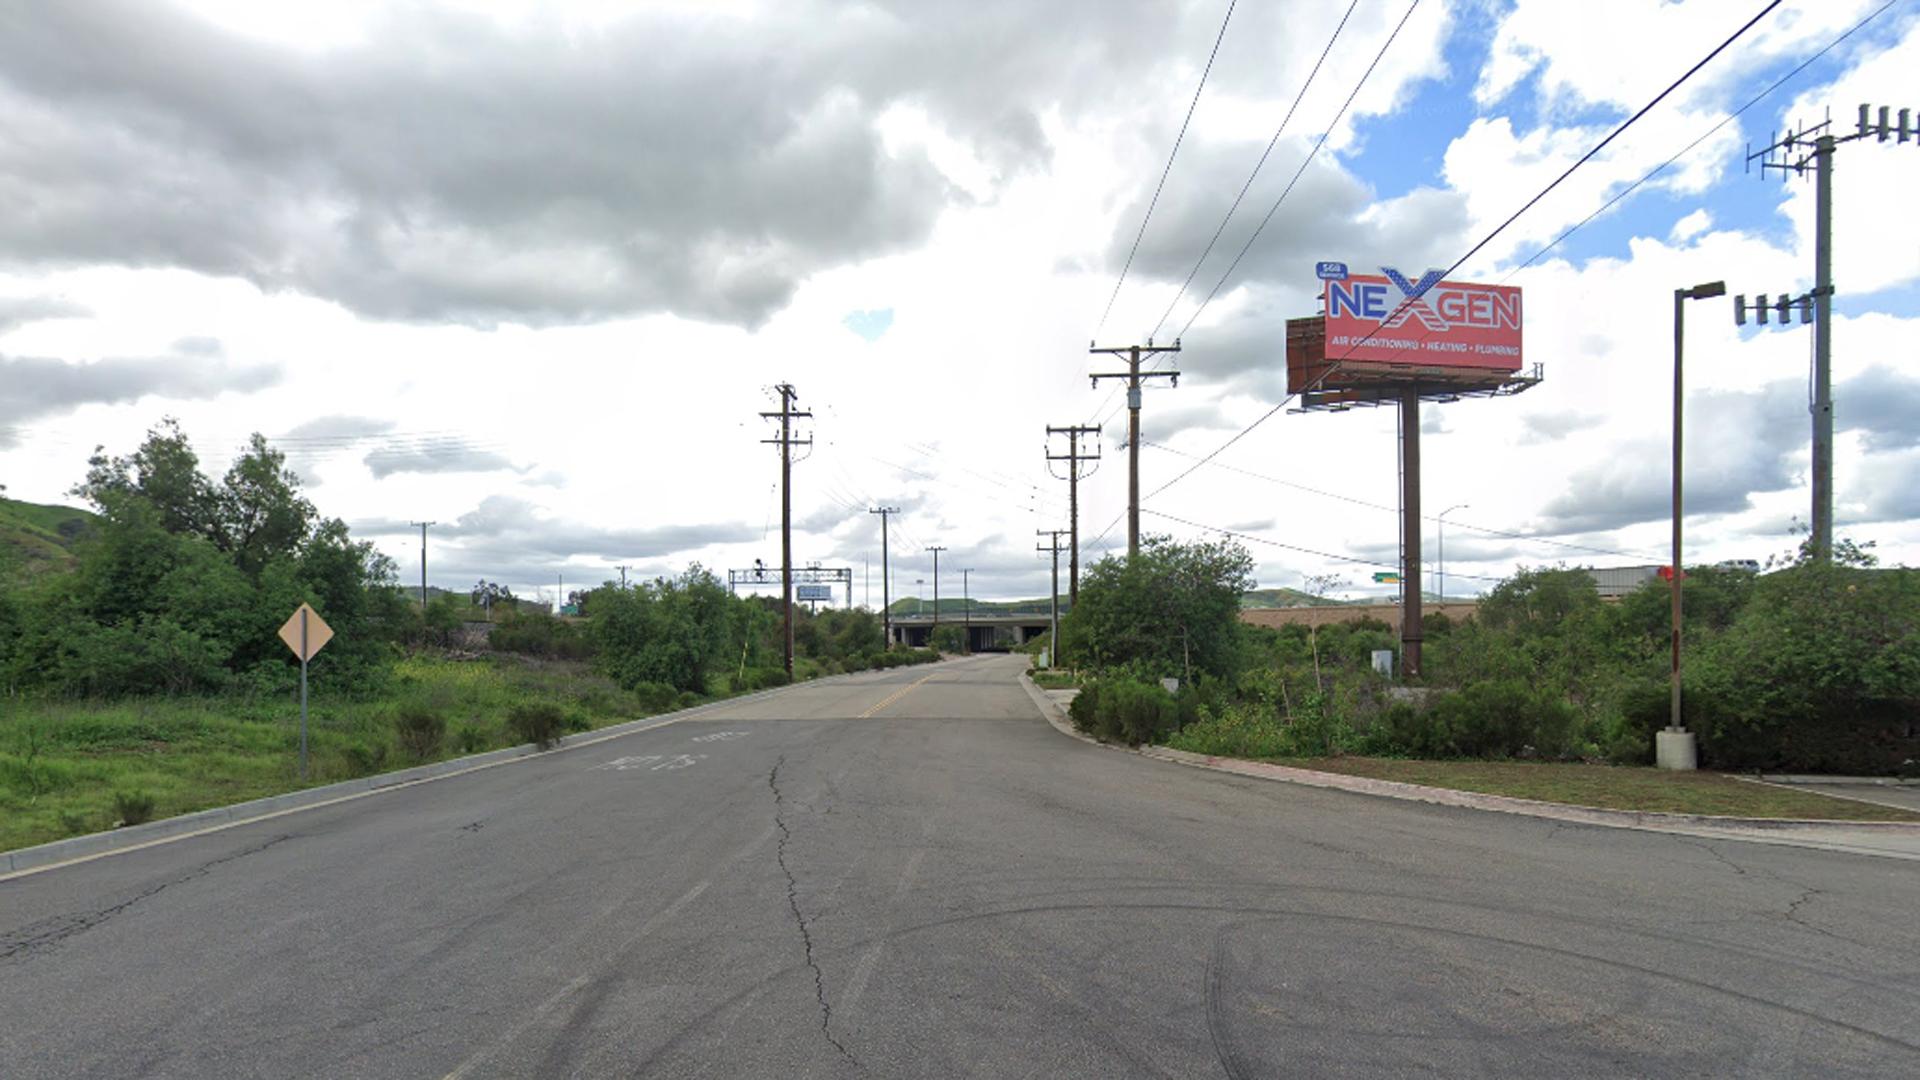 The 4000 block of Prado Road in Corona, as viewed in a Google Street View image.